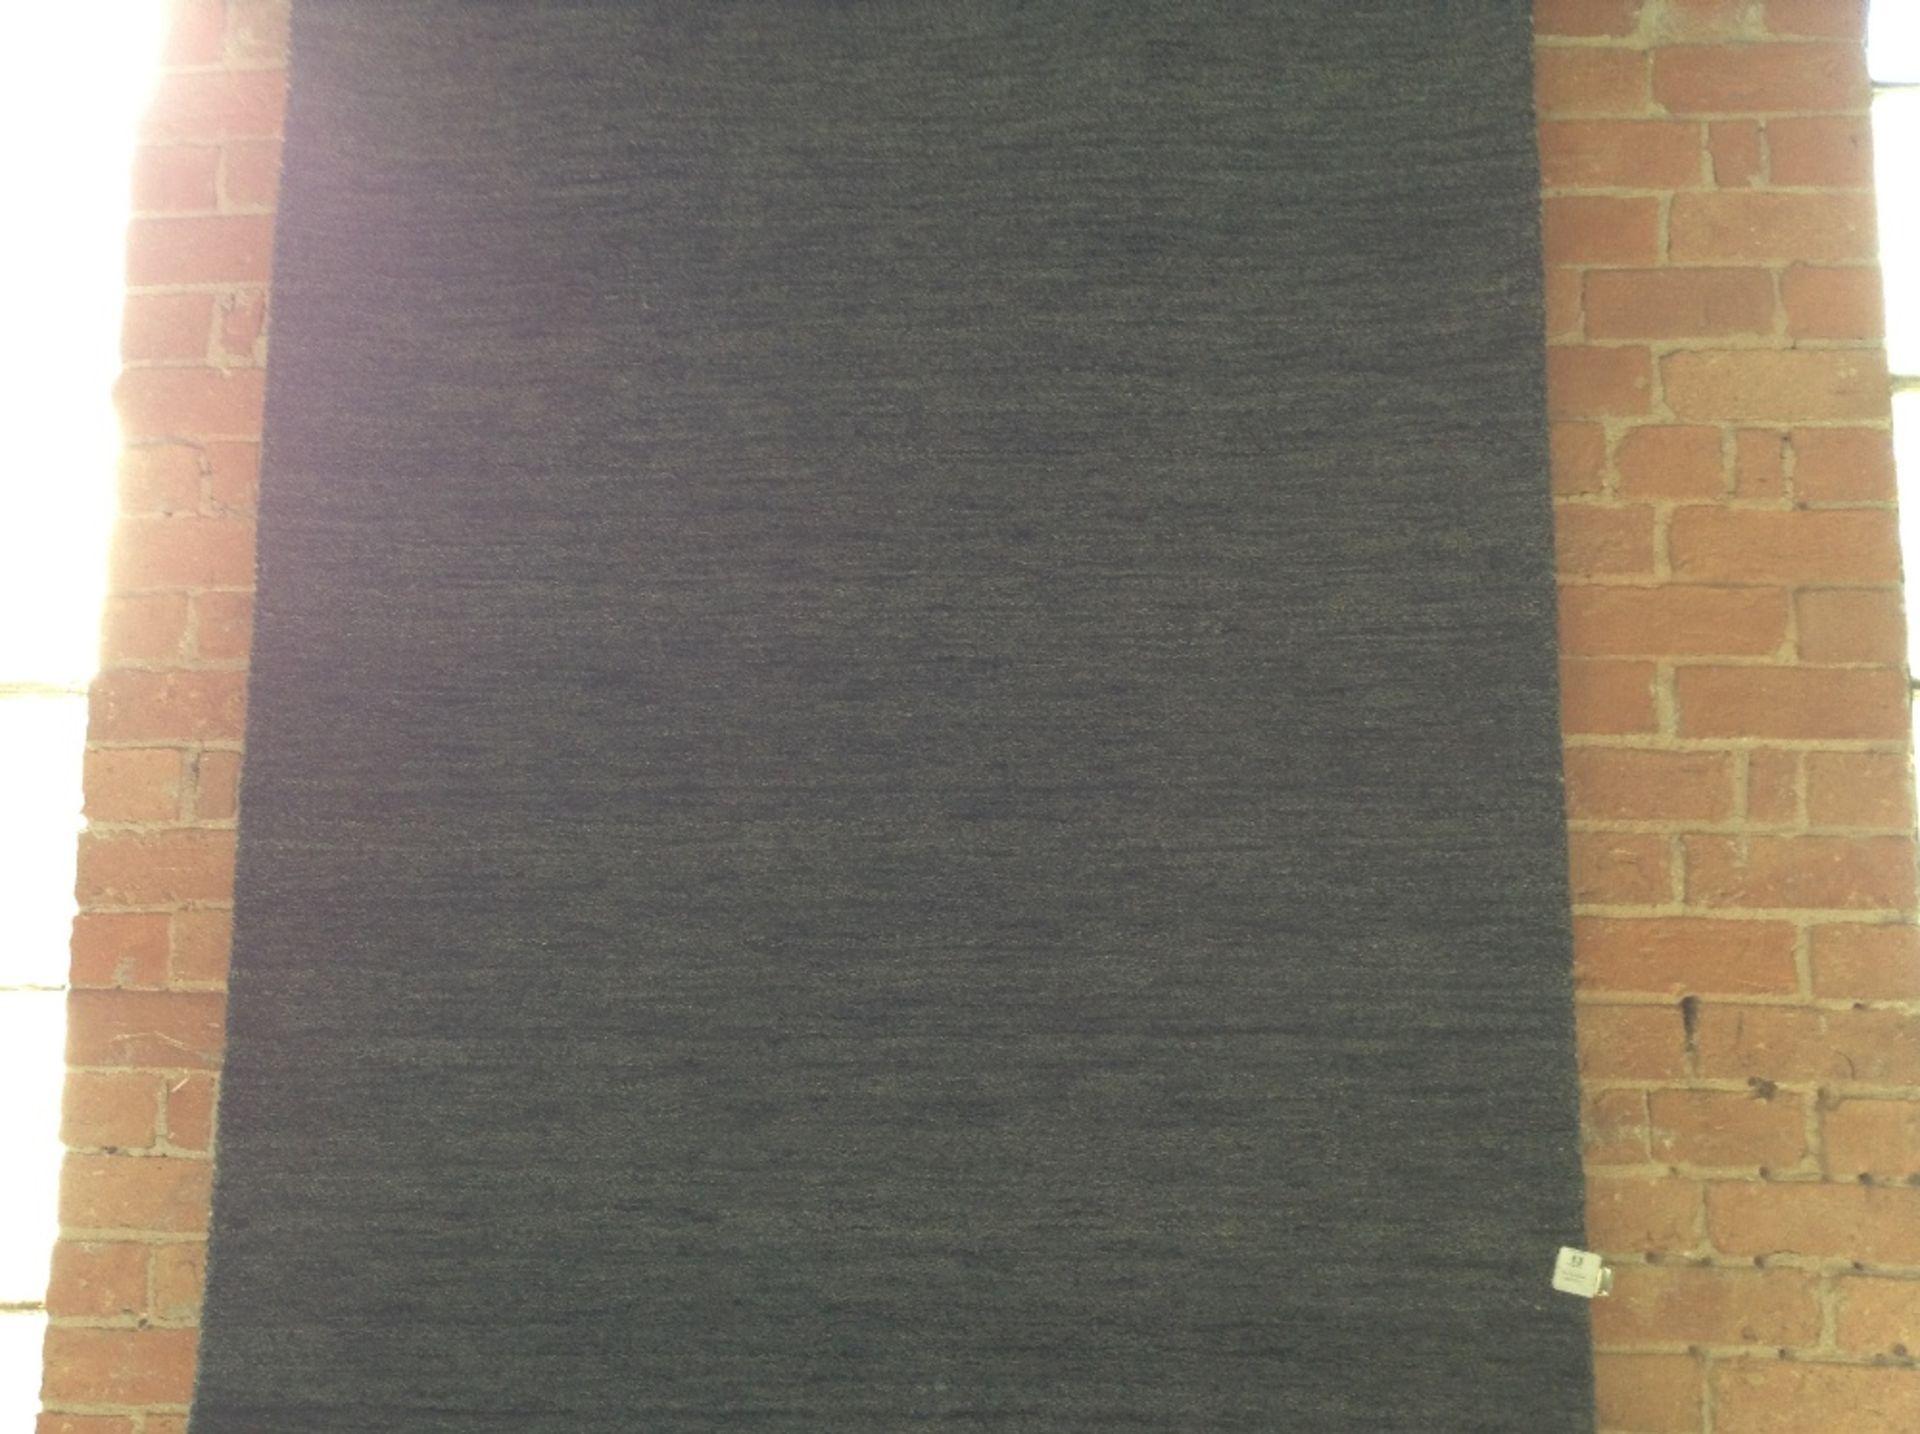 Lot 13 - Theko Handgefertigter Teppich Harmony in Anthrazit